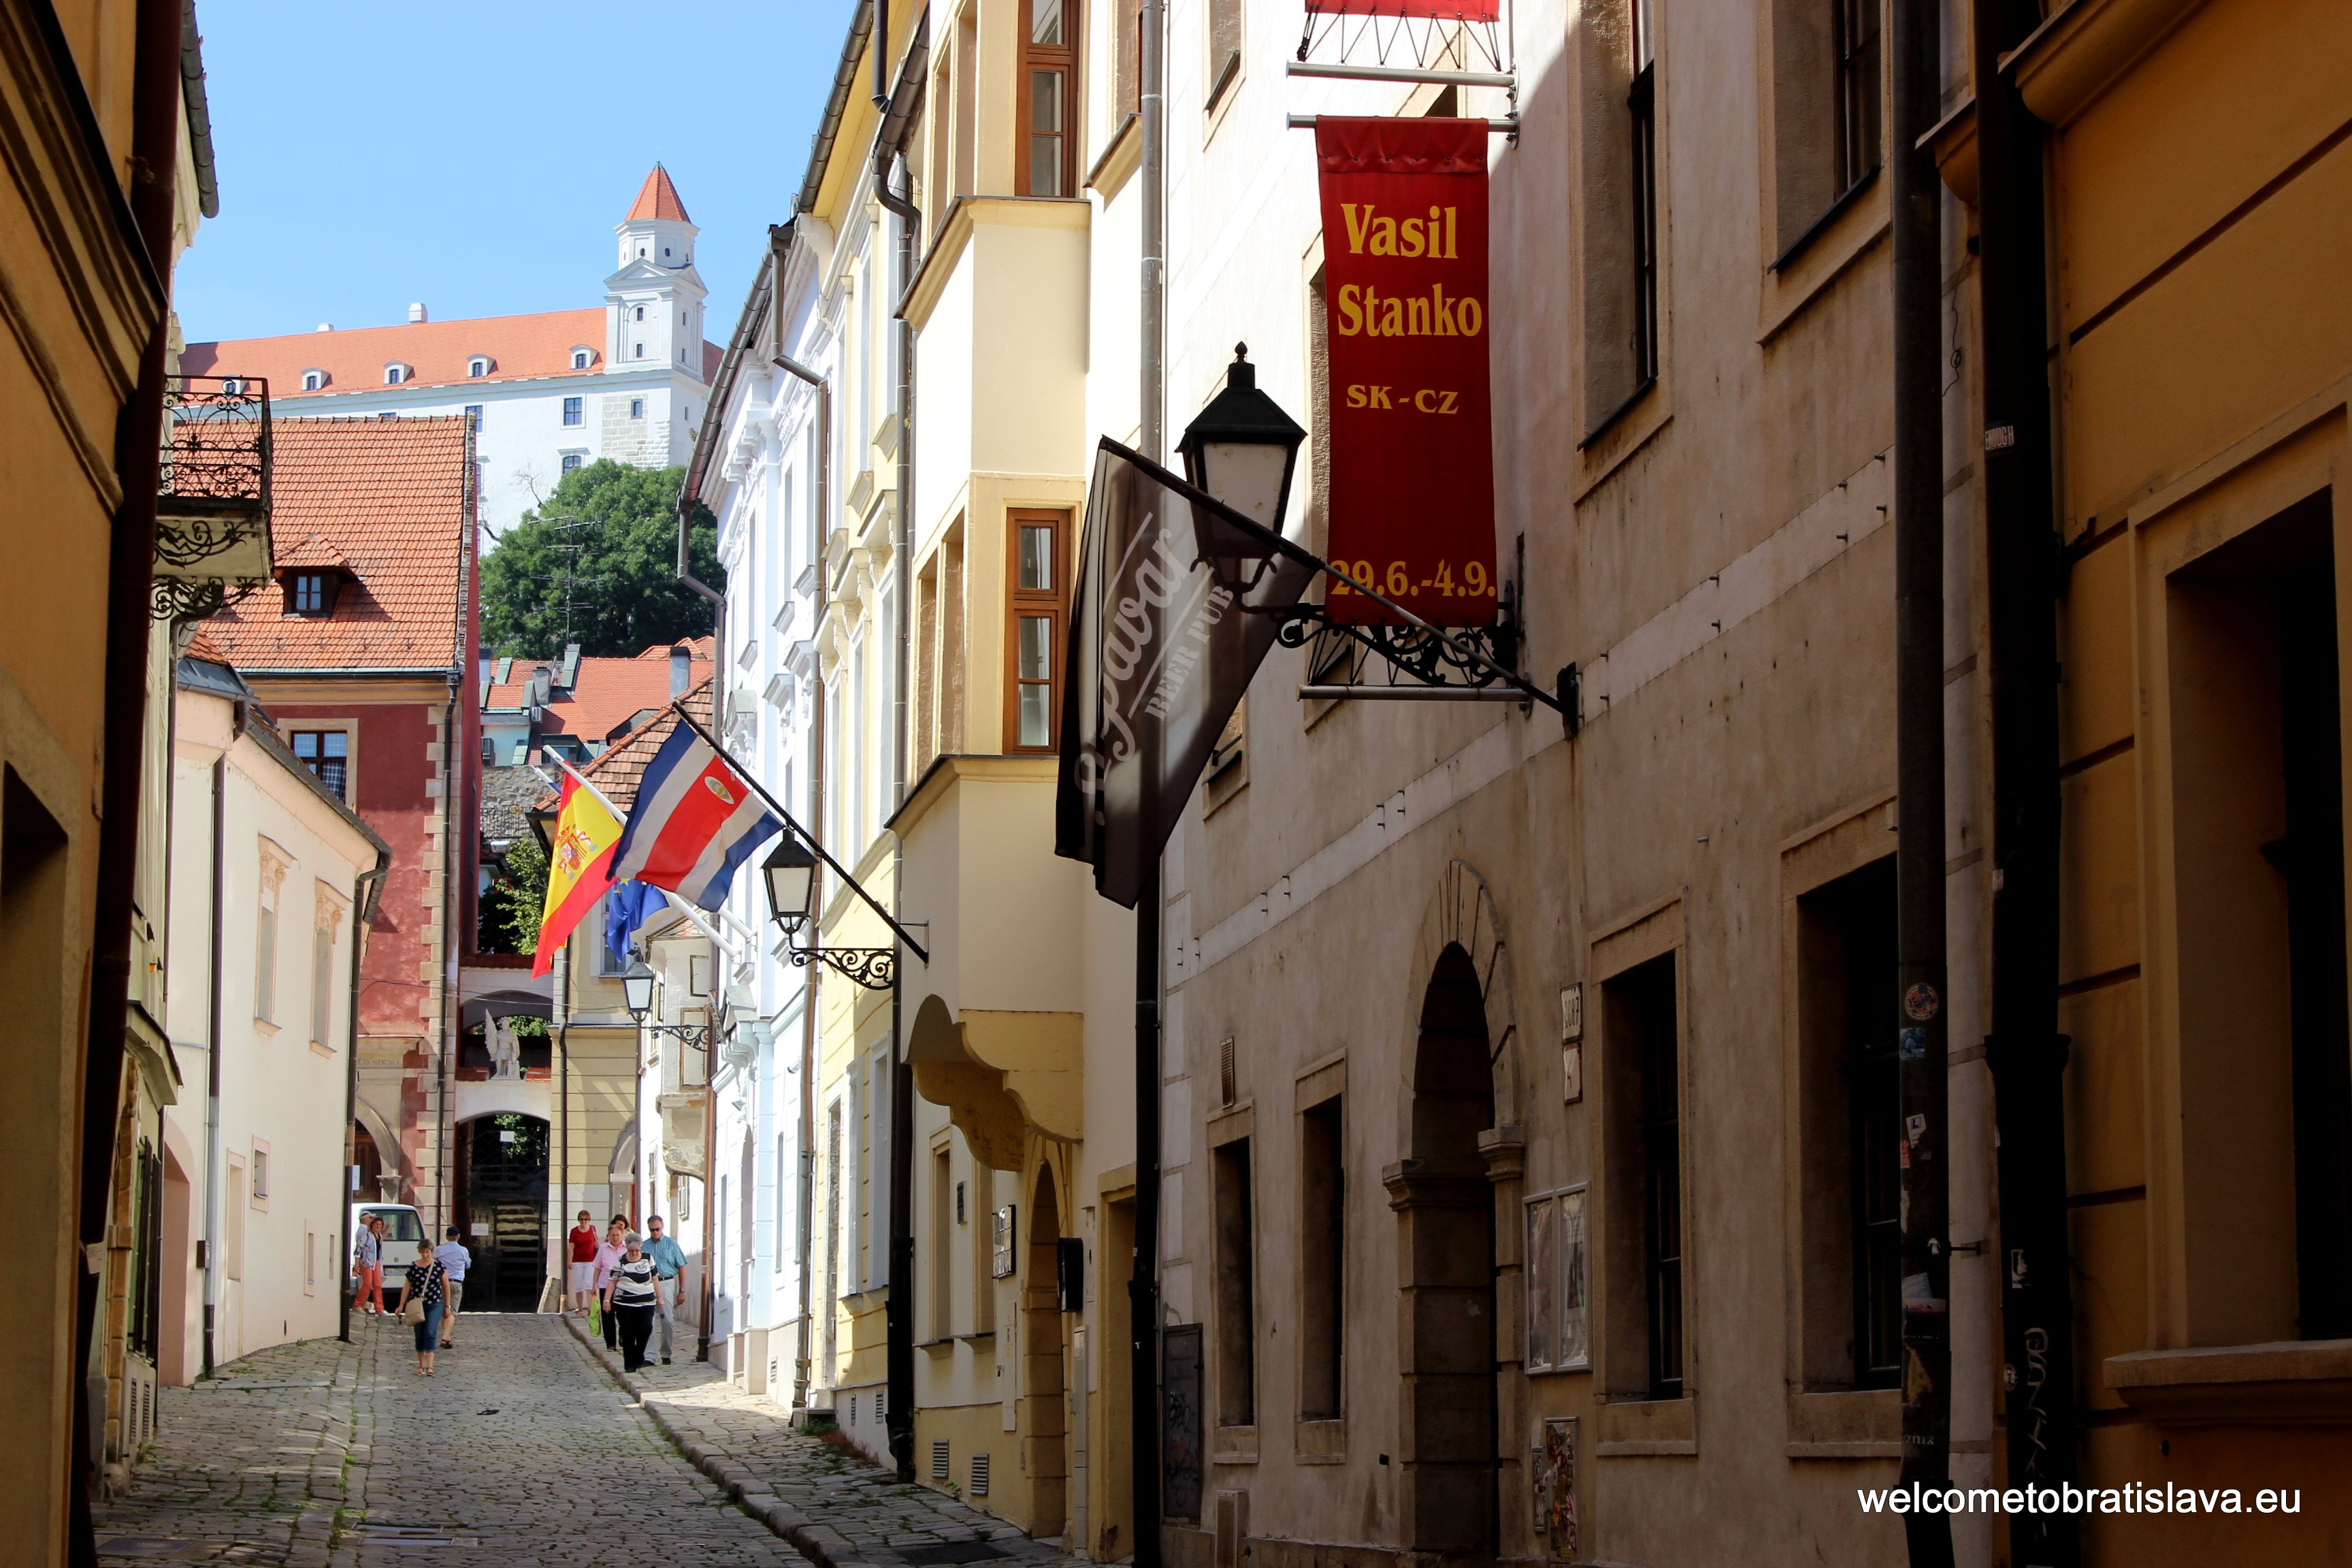 Coronation journey - Prepostska Street